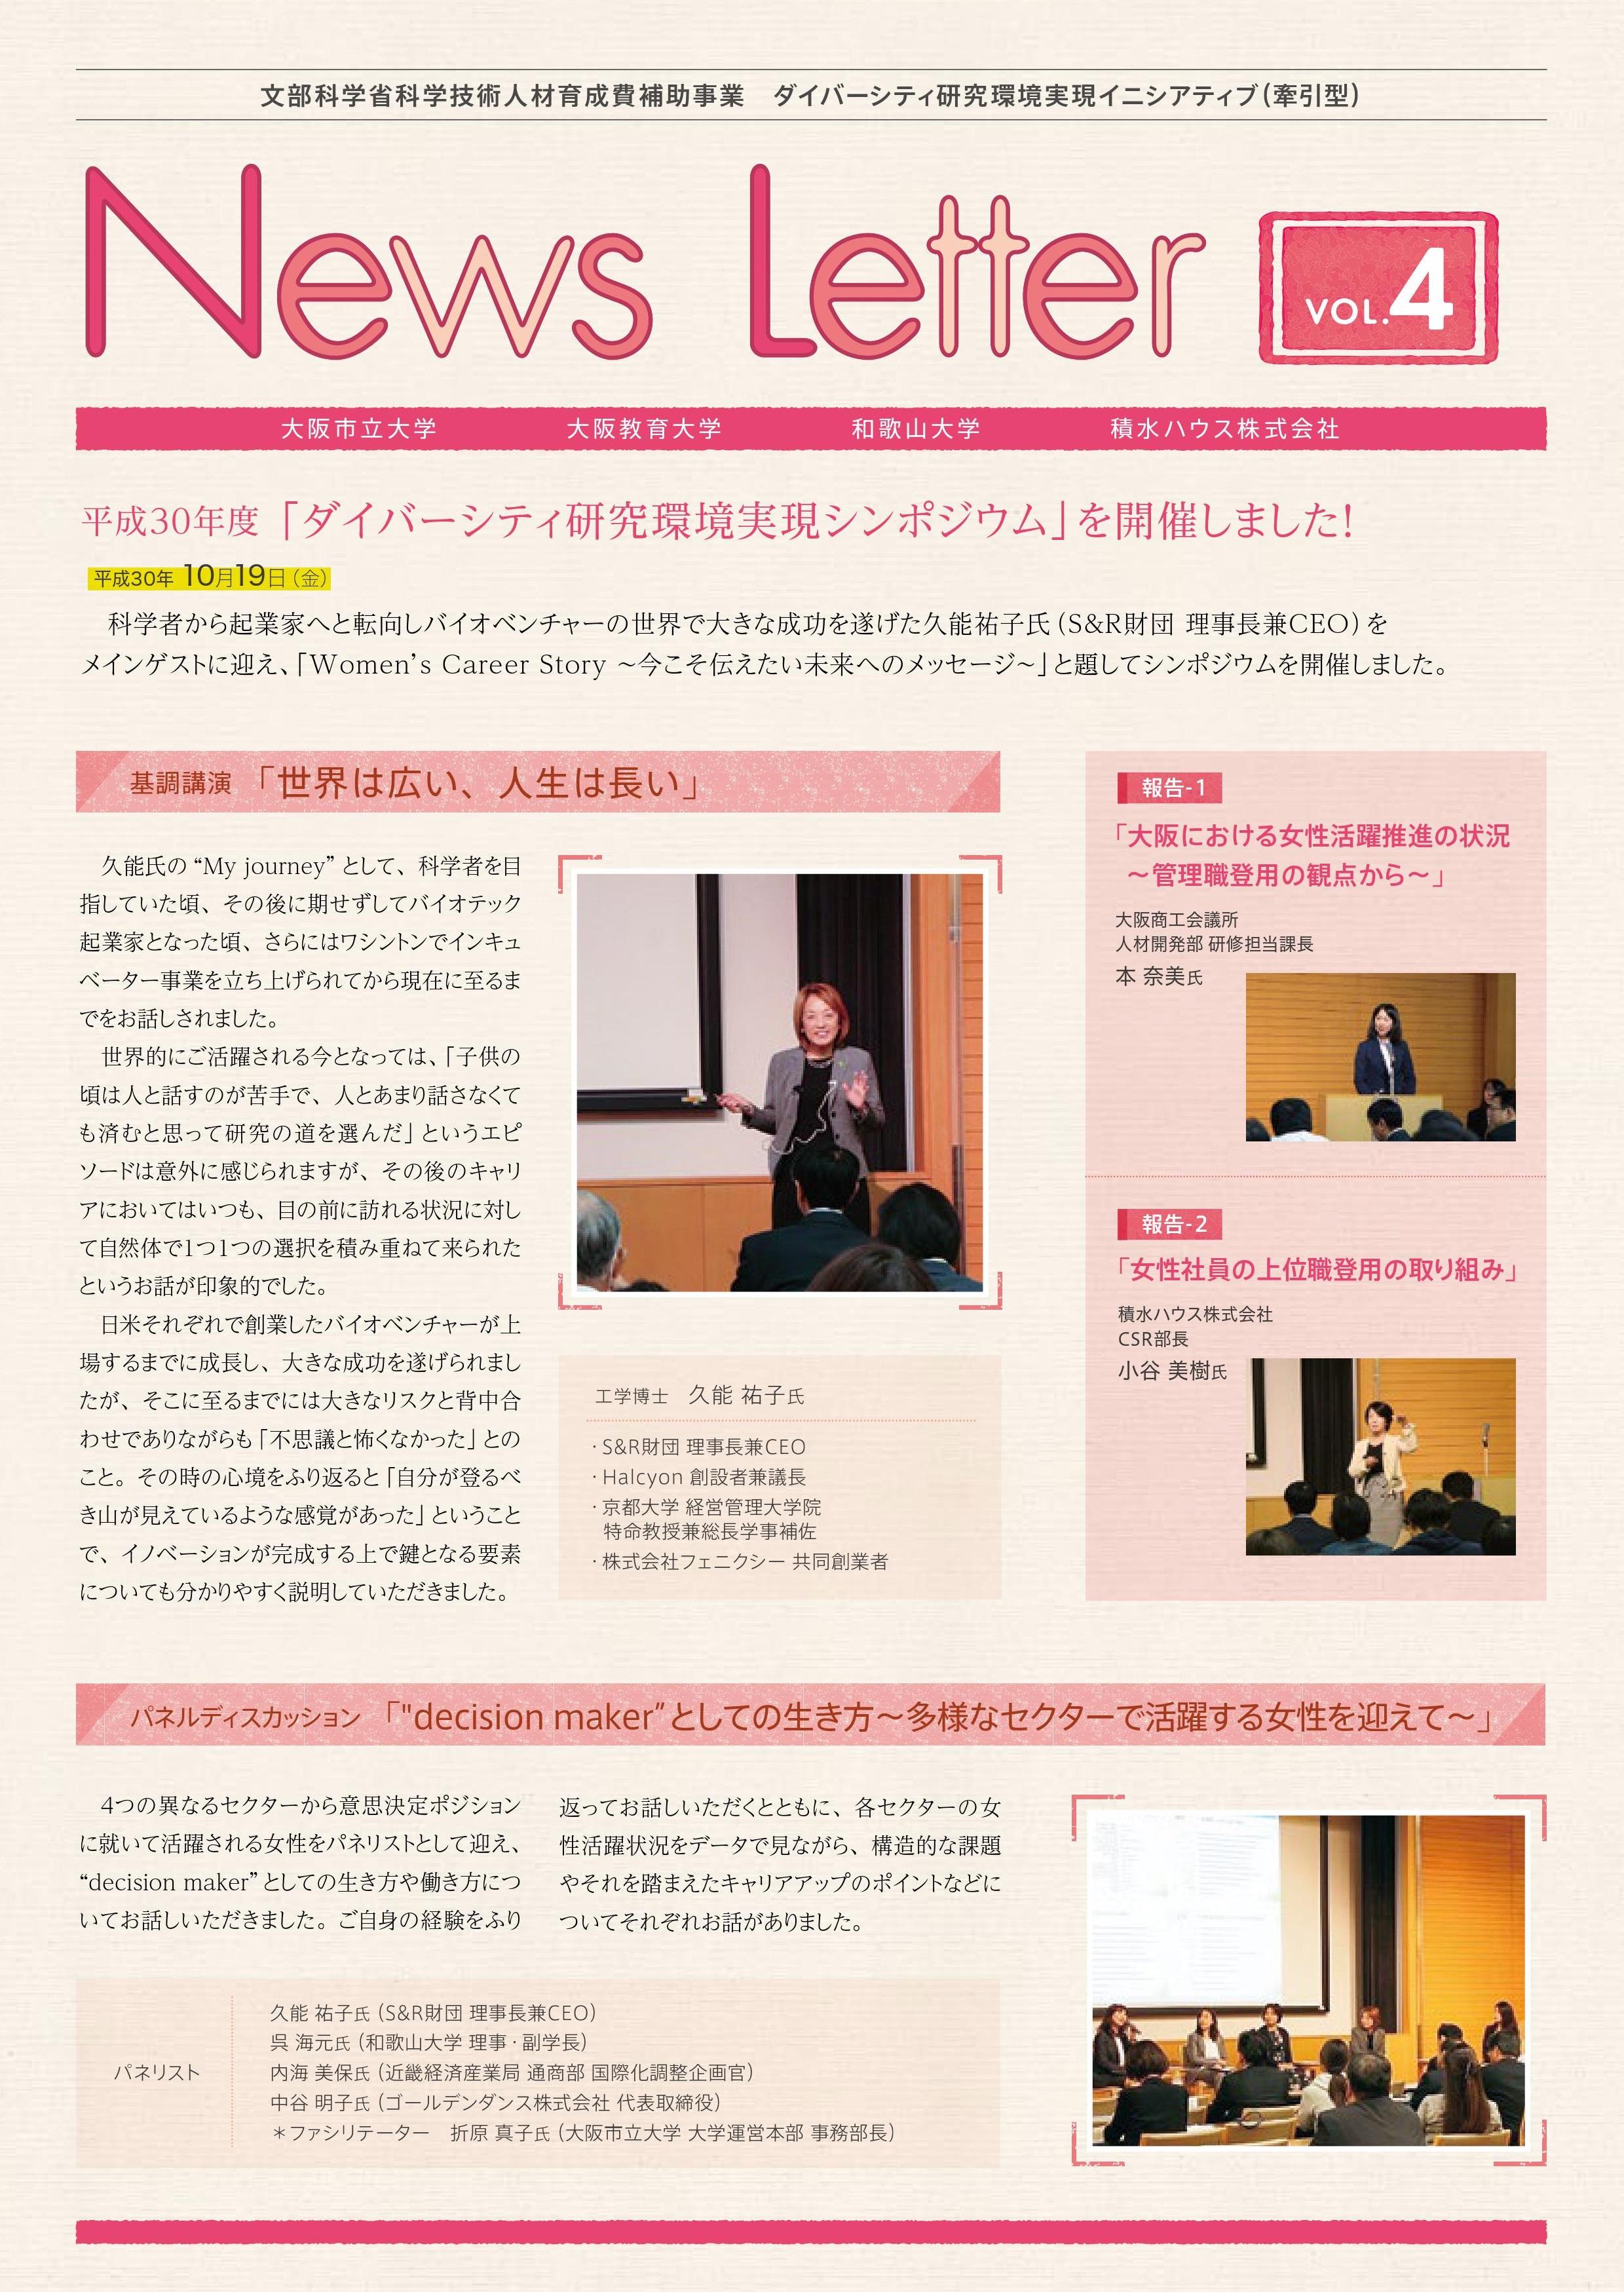 NewsLetter_vol4